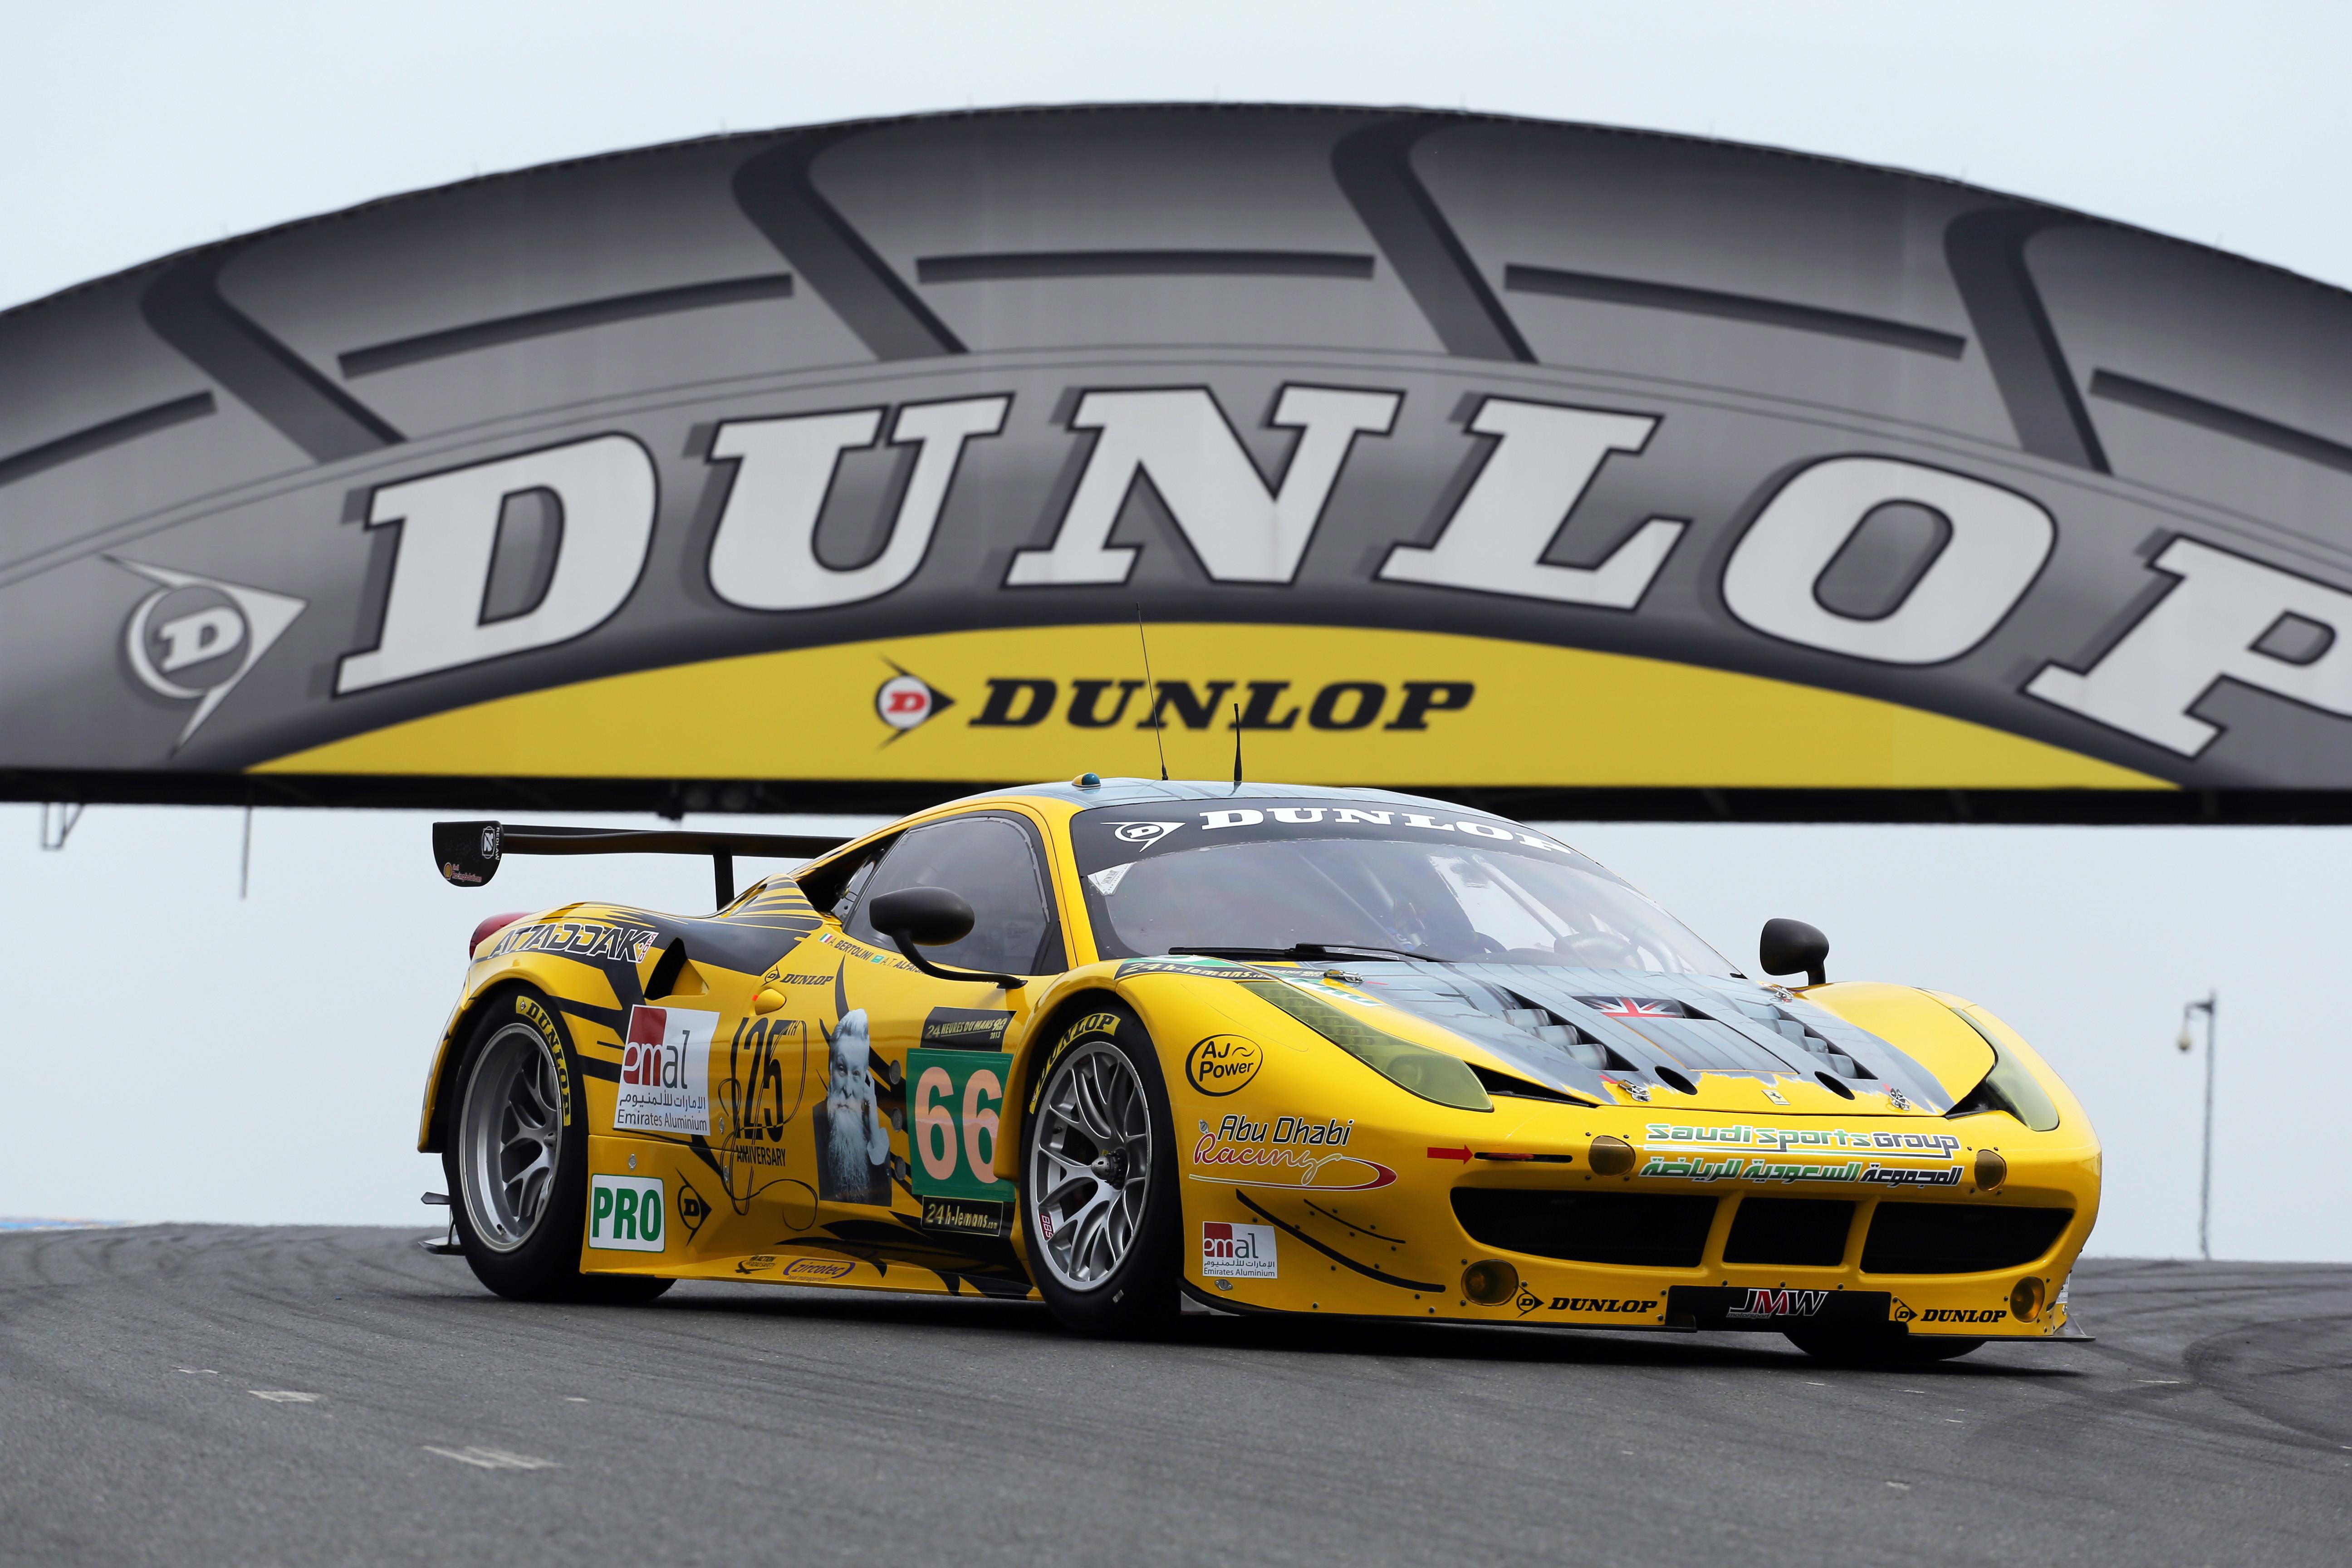 Dunlop fornitore esclusivo European Le Mans Series